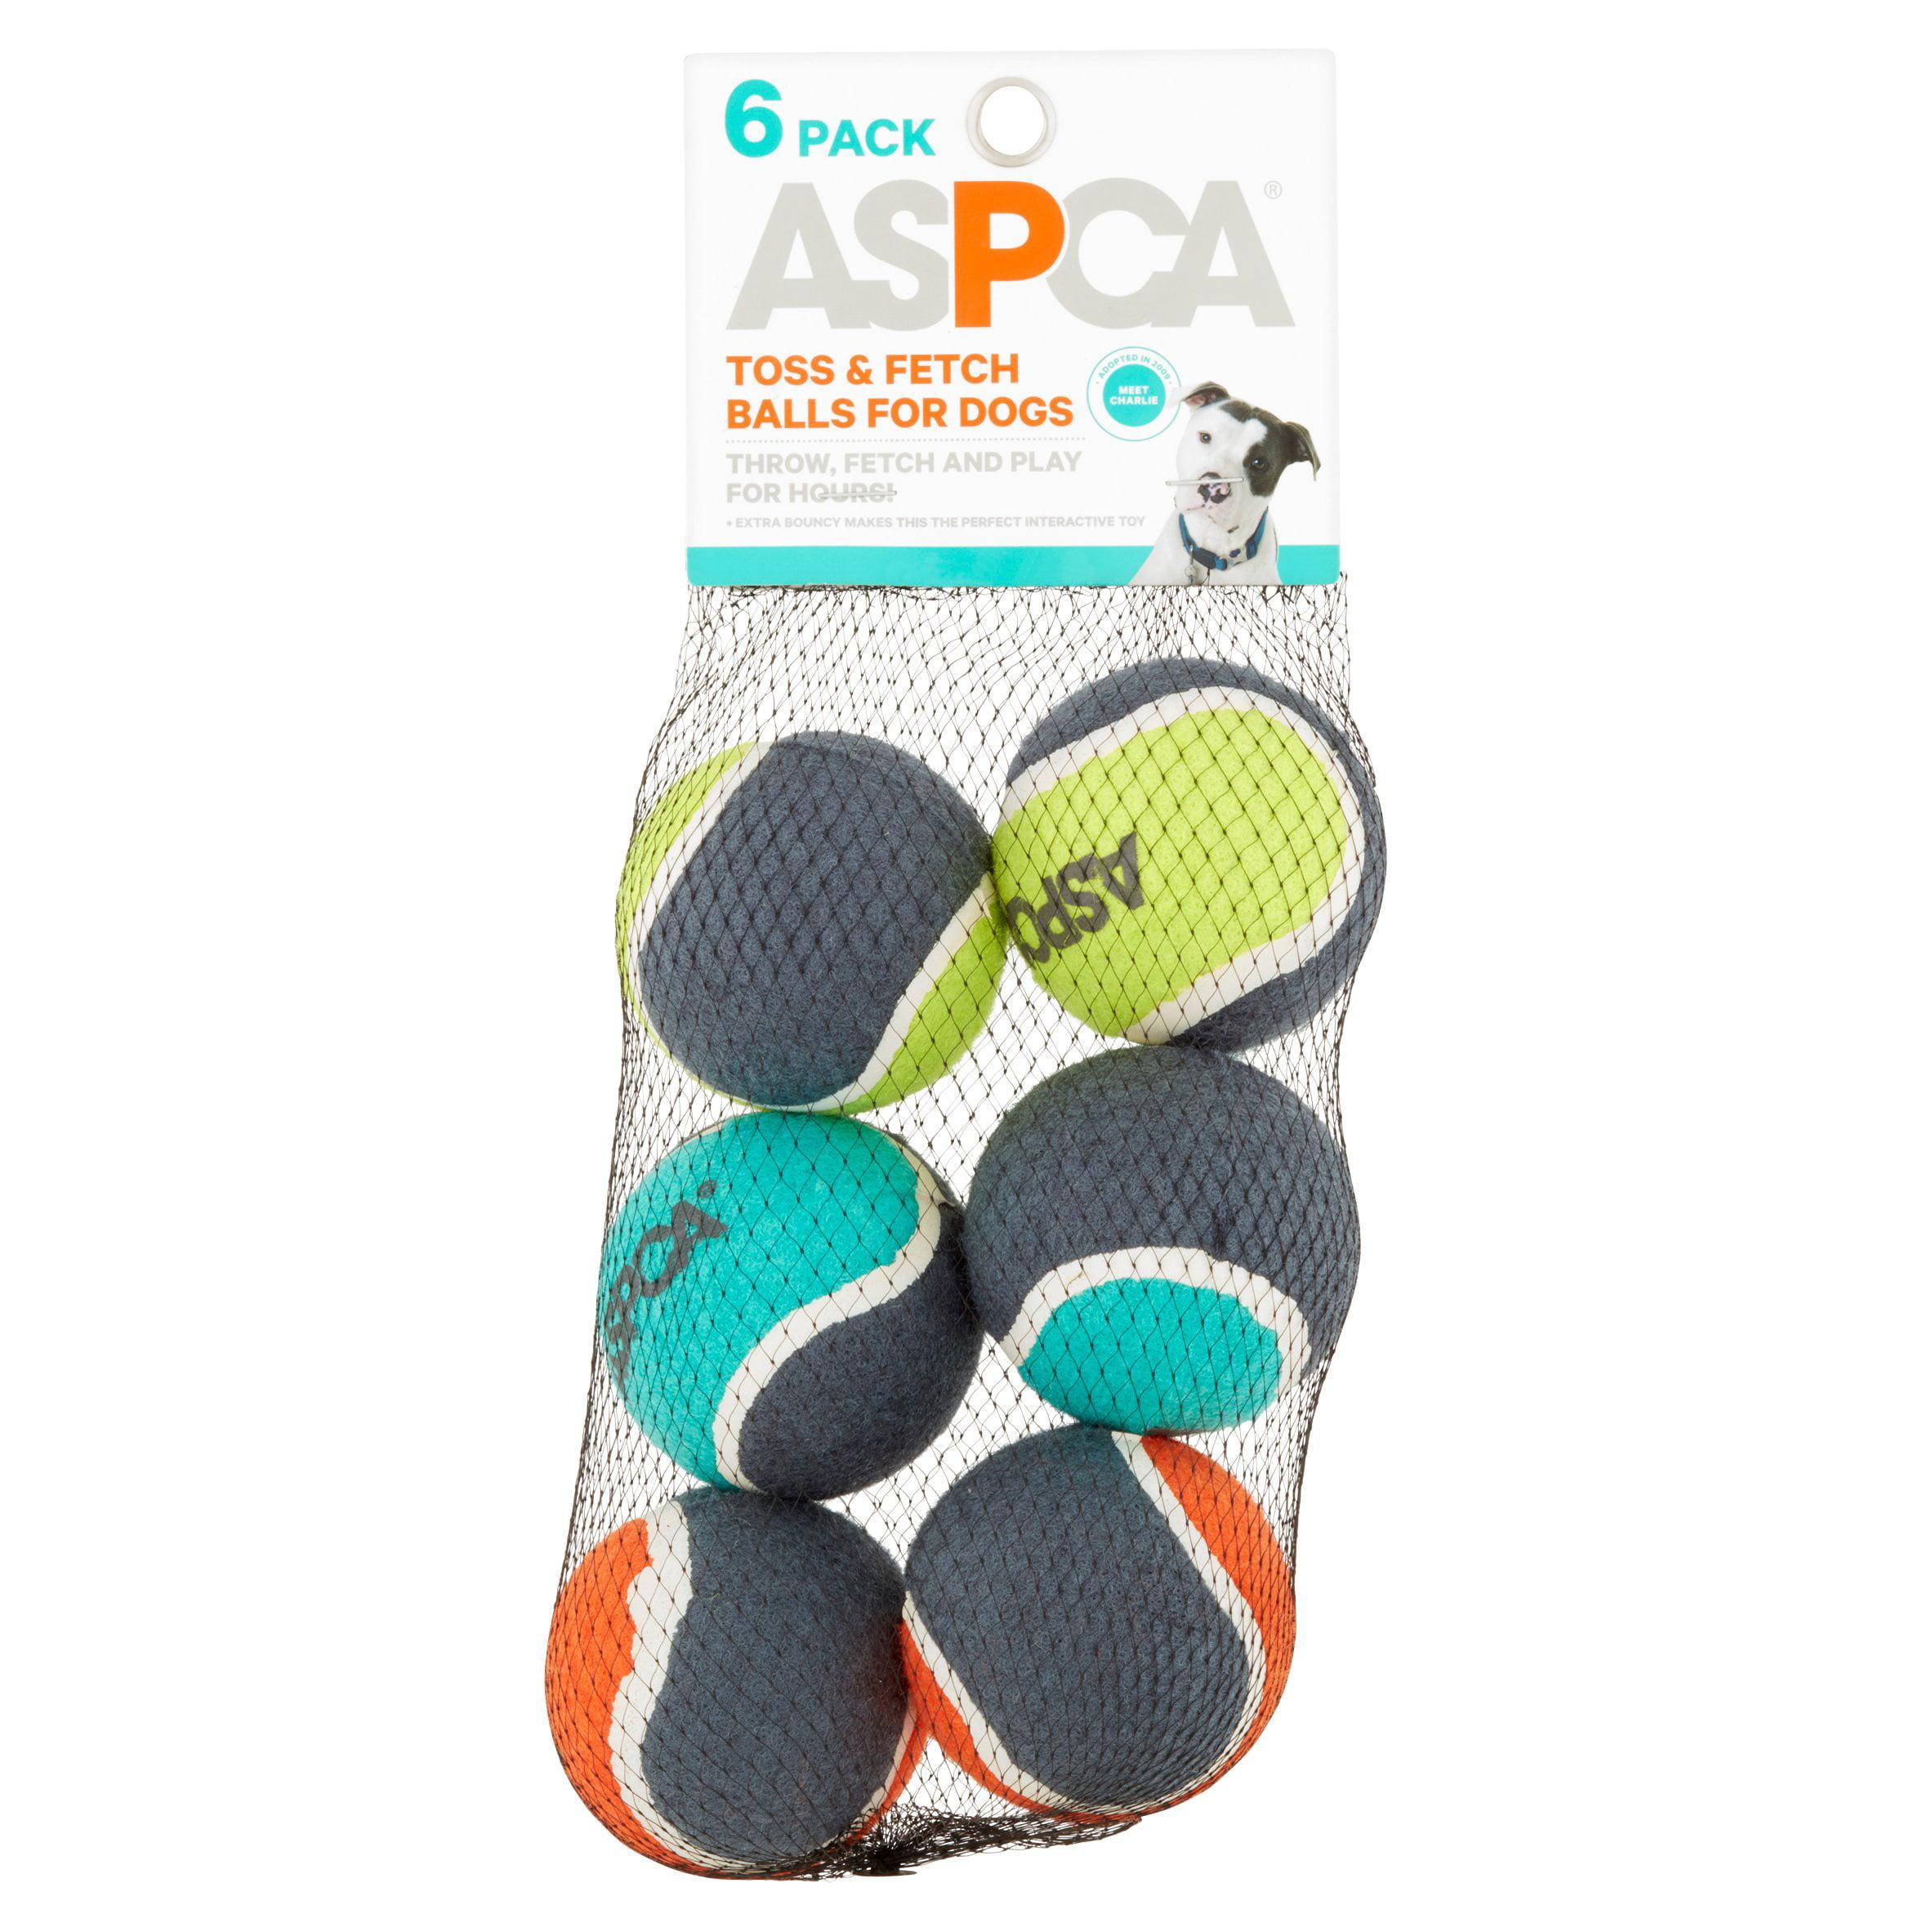 Aspca Tennis Ball toss & Fetch Balls Dog Toy, 6 Ct, Mulicolor by European Home Designs, LLC